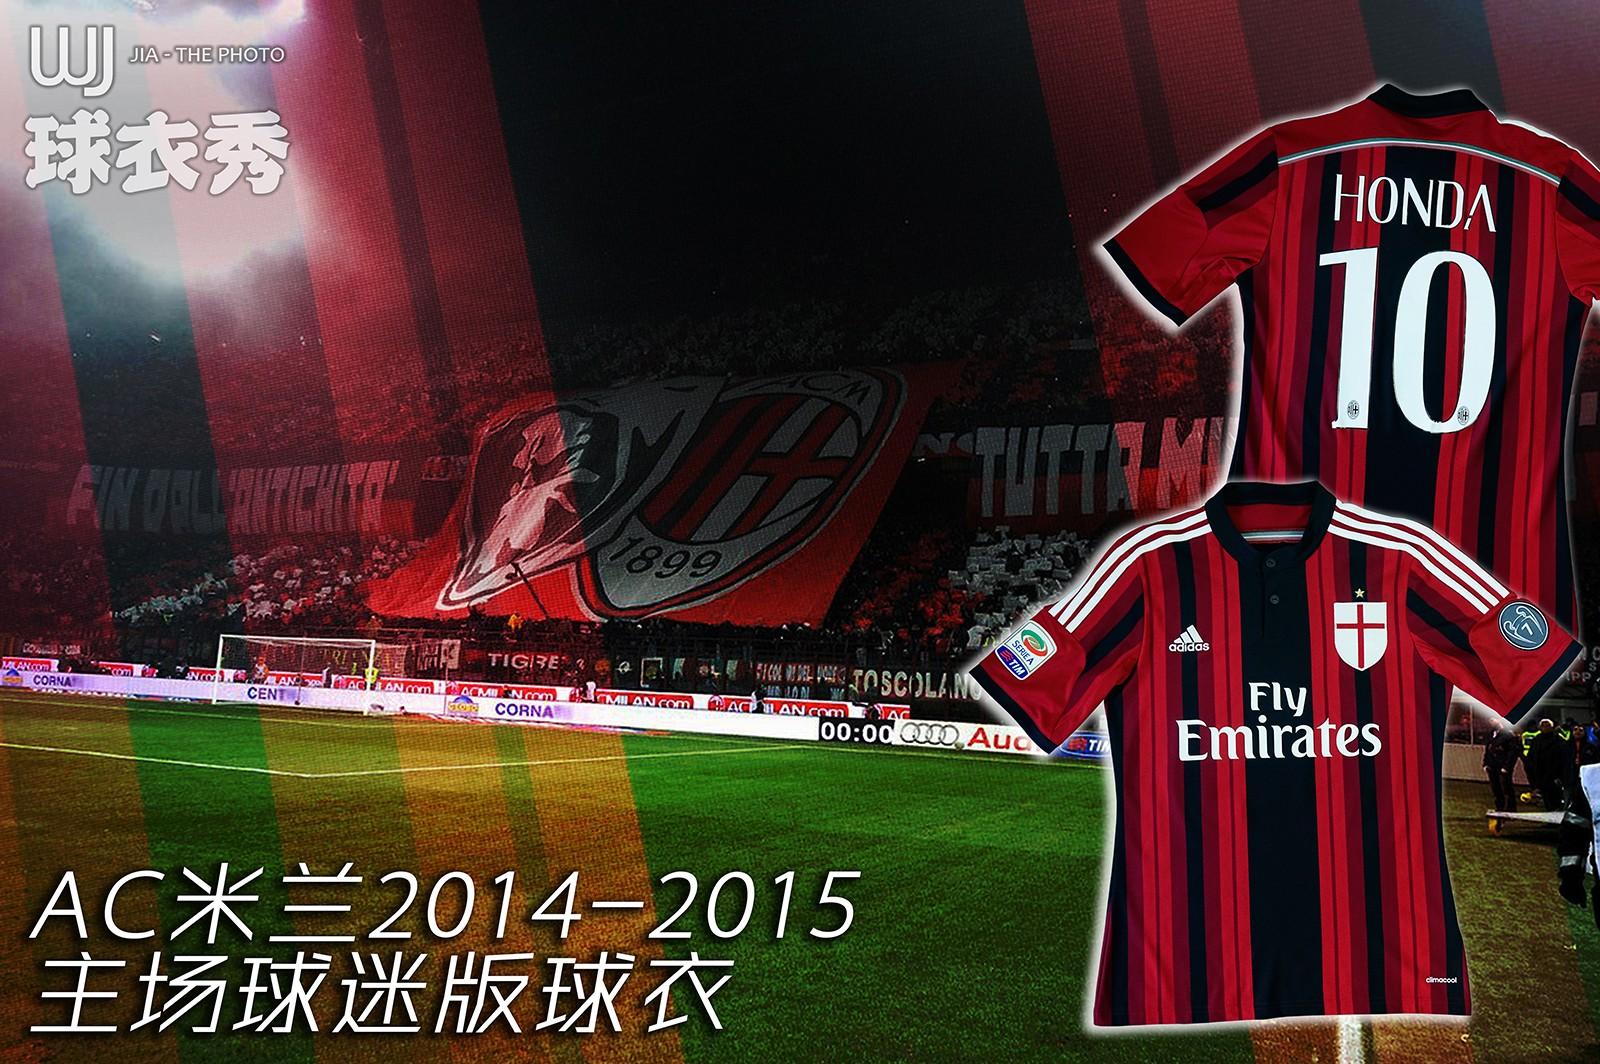 ac米兰球迷之家 球衣秀:AC米兰2014-2015主场球迷版球衣